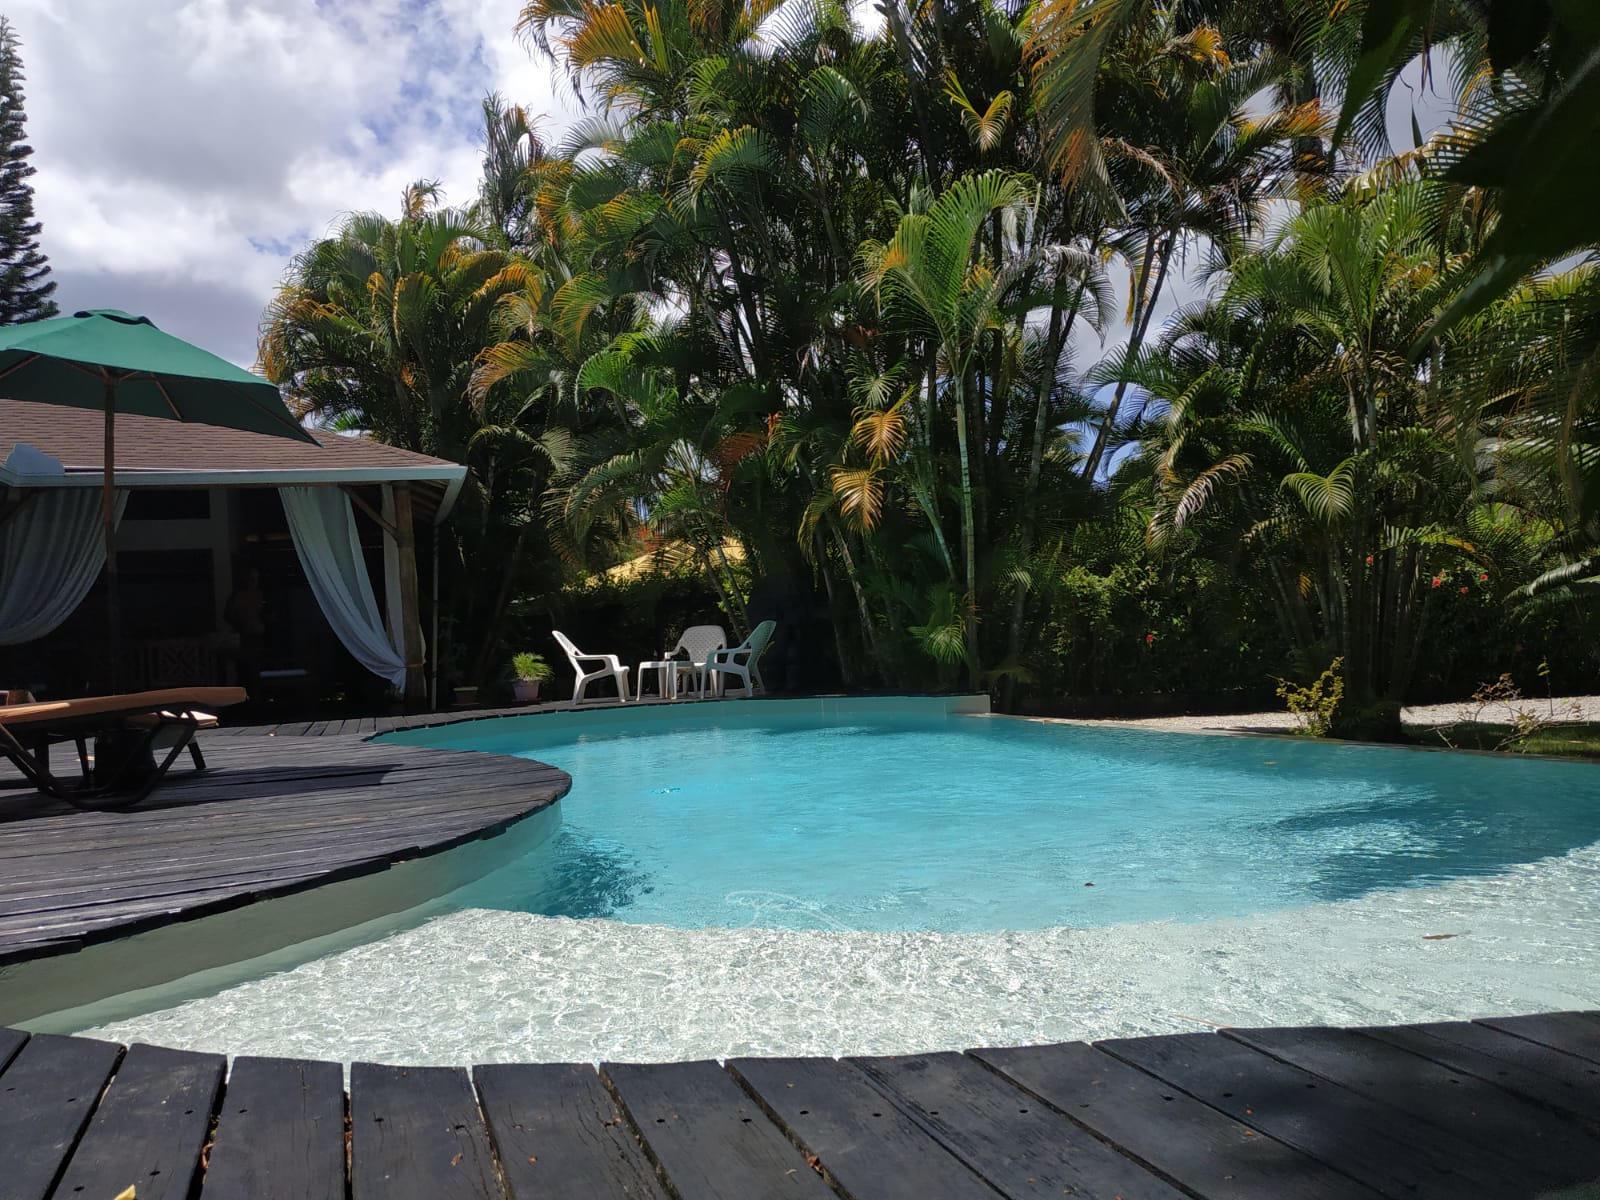 Villa Authentic Carribean Real Estate Las Terrenas Dominican Republic13.jpg